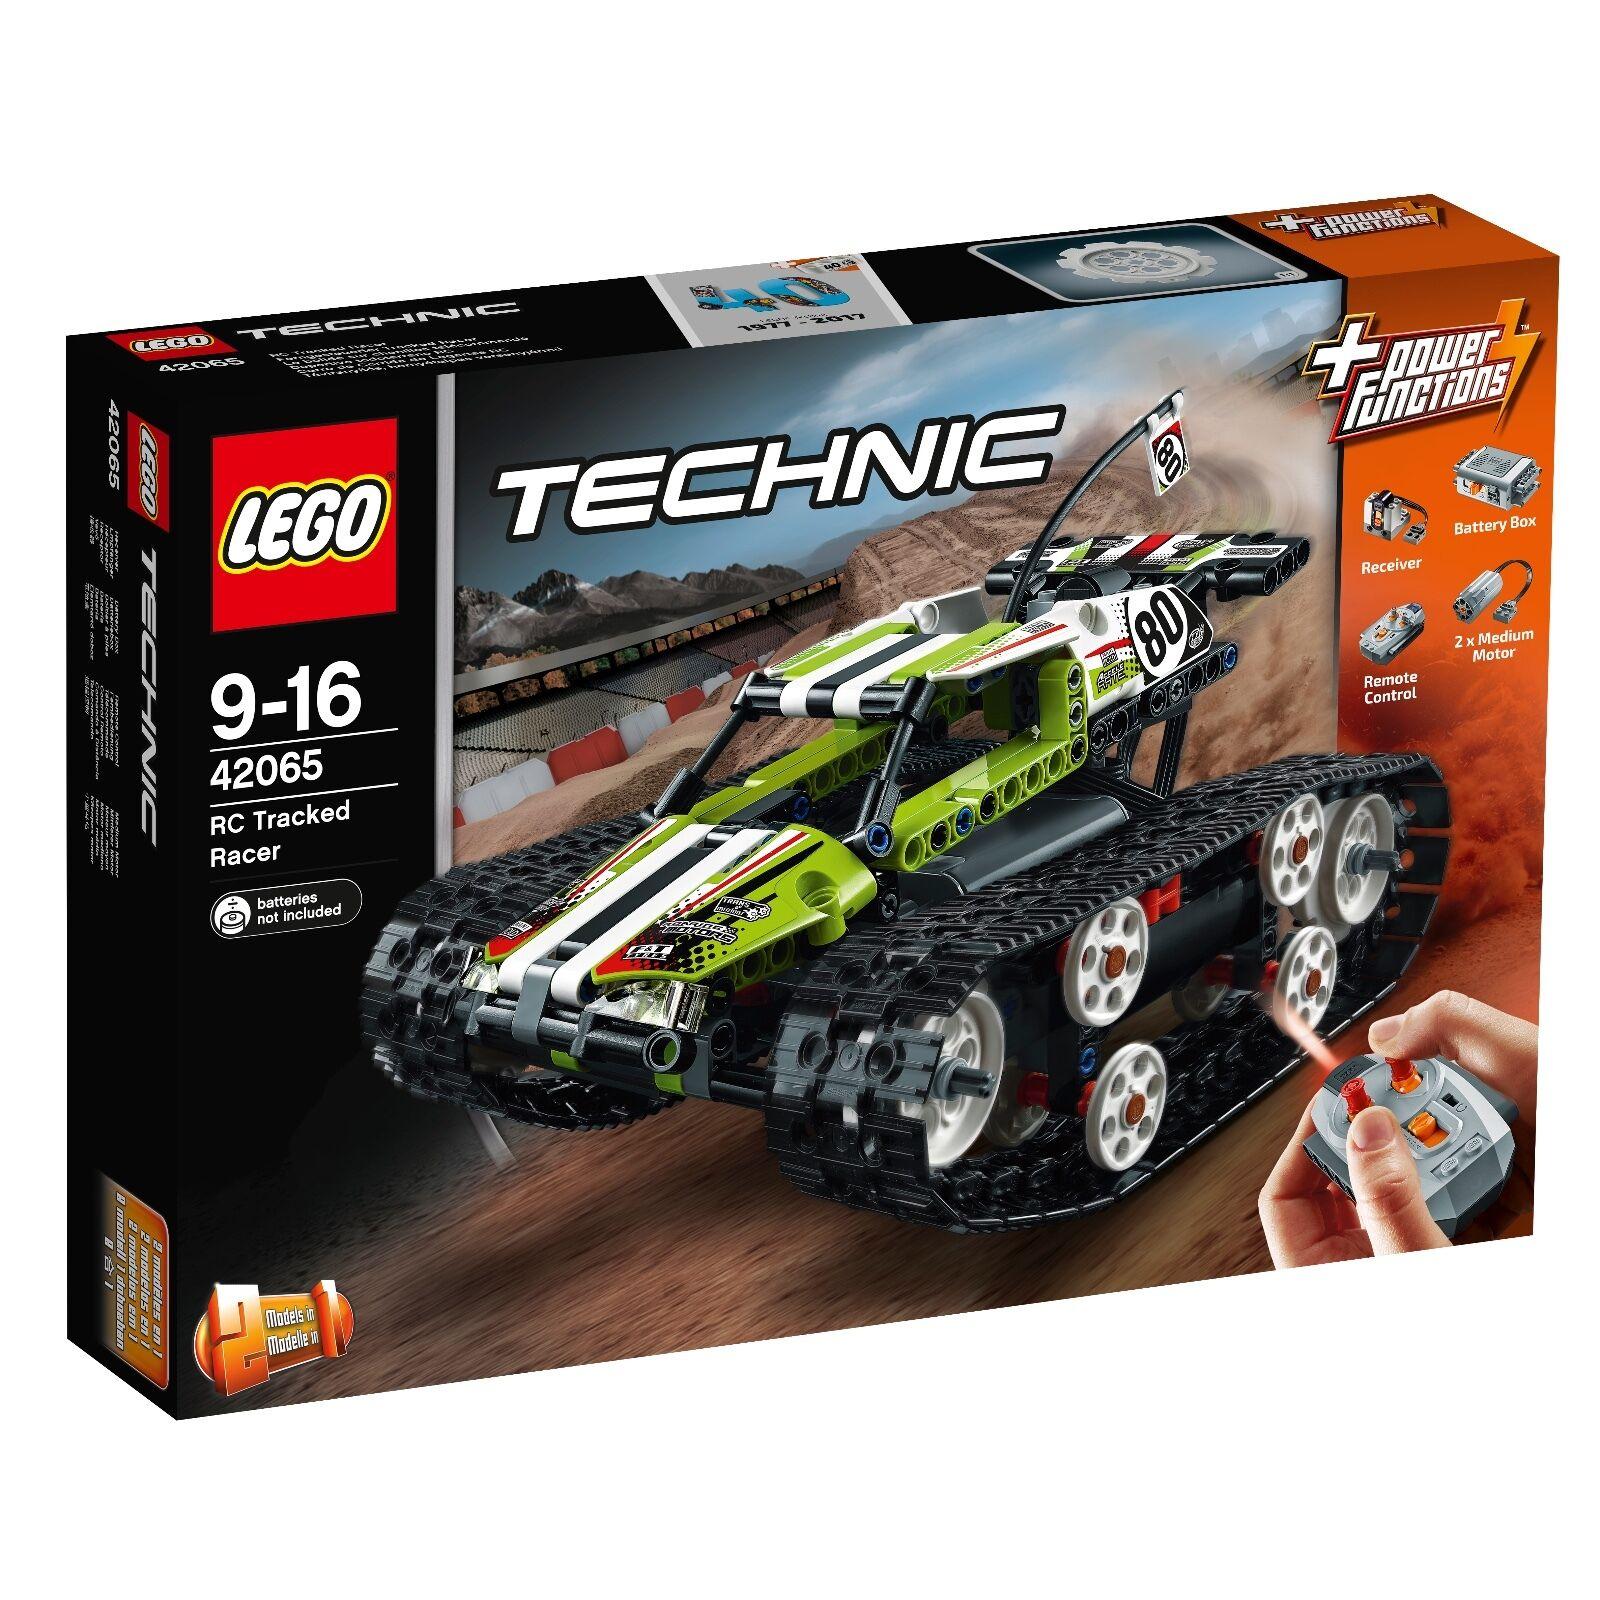 LEGO® Technic 42065 Ferngesteuerter Tracked Racer NEU OVP_ RC Tracked Racer NEW